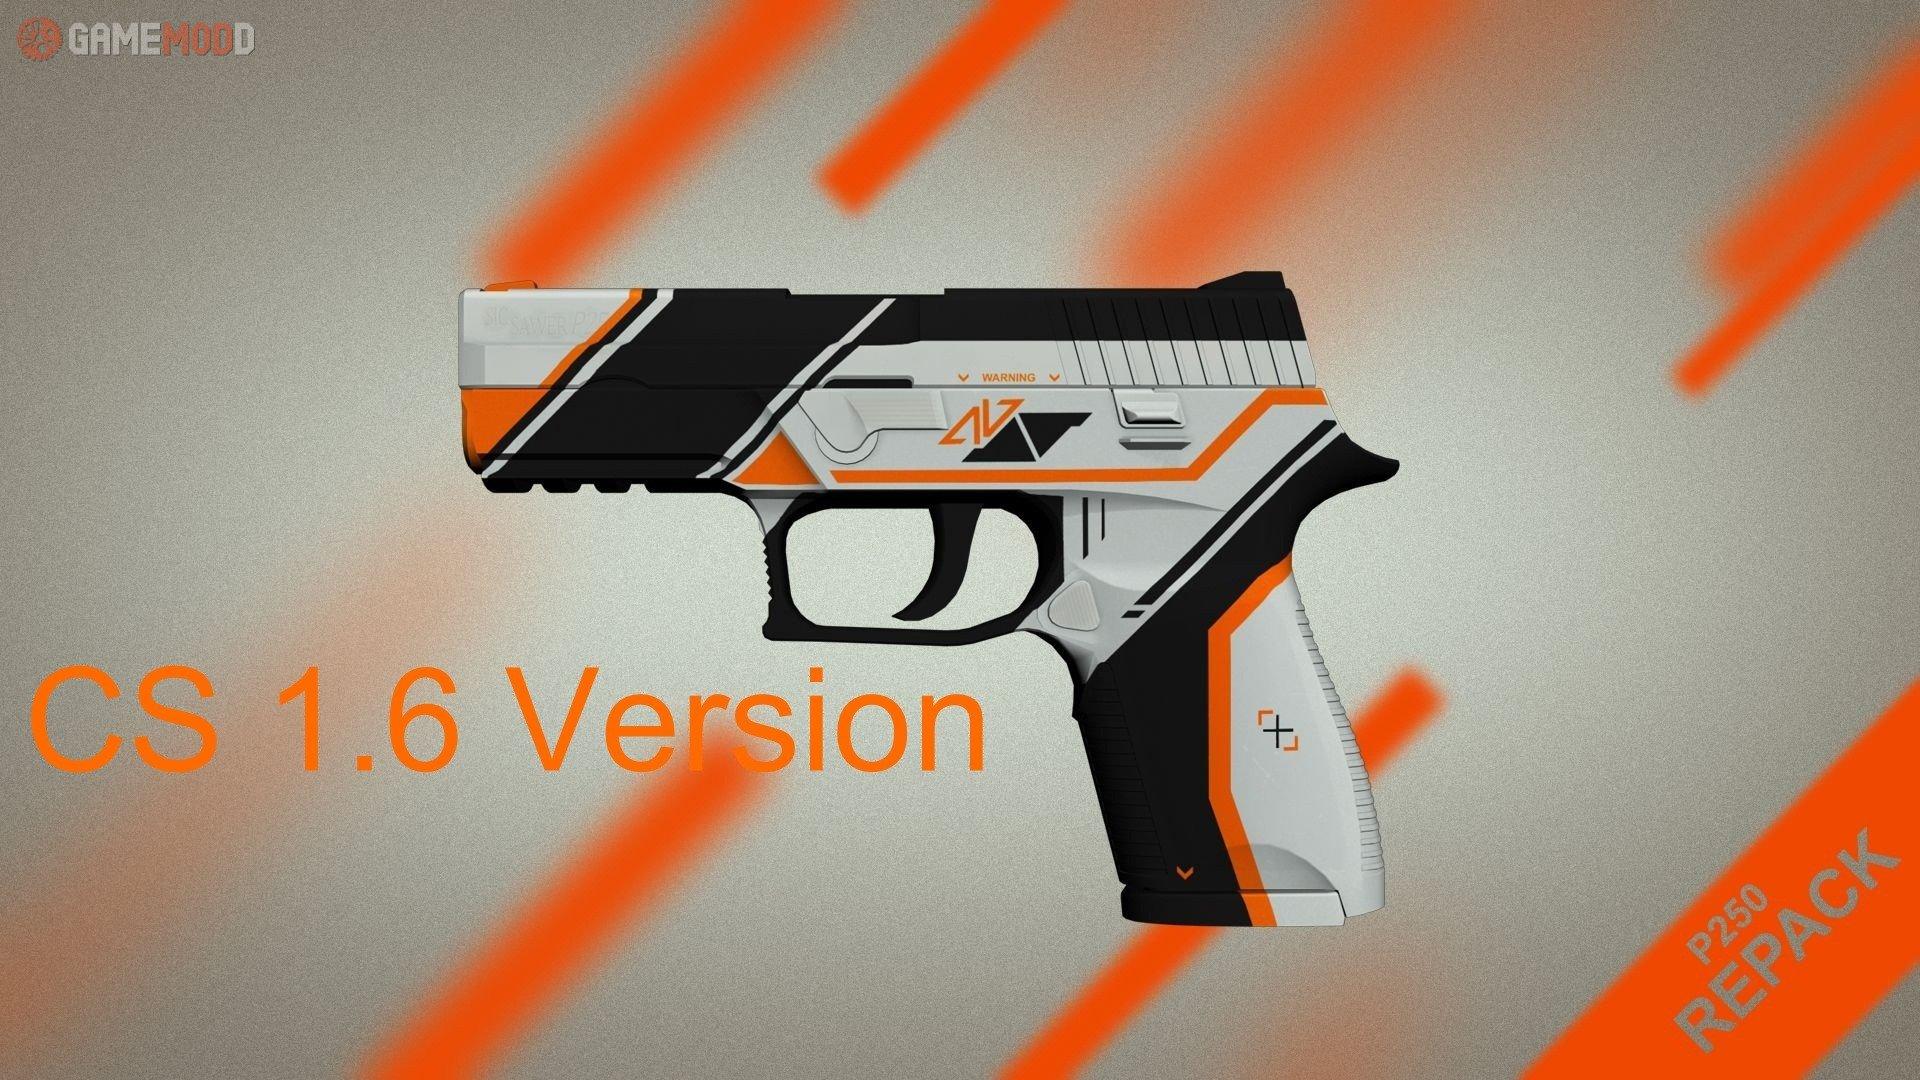 Csgo p250 asiimov for cs 1 6 cs 1 6 skins weapons sig p228 gamemodd - Awp asiimov cs 1 6 ...